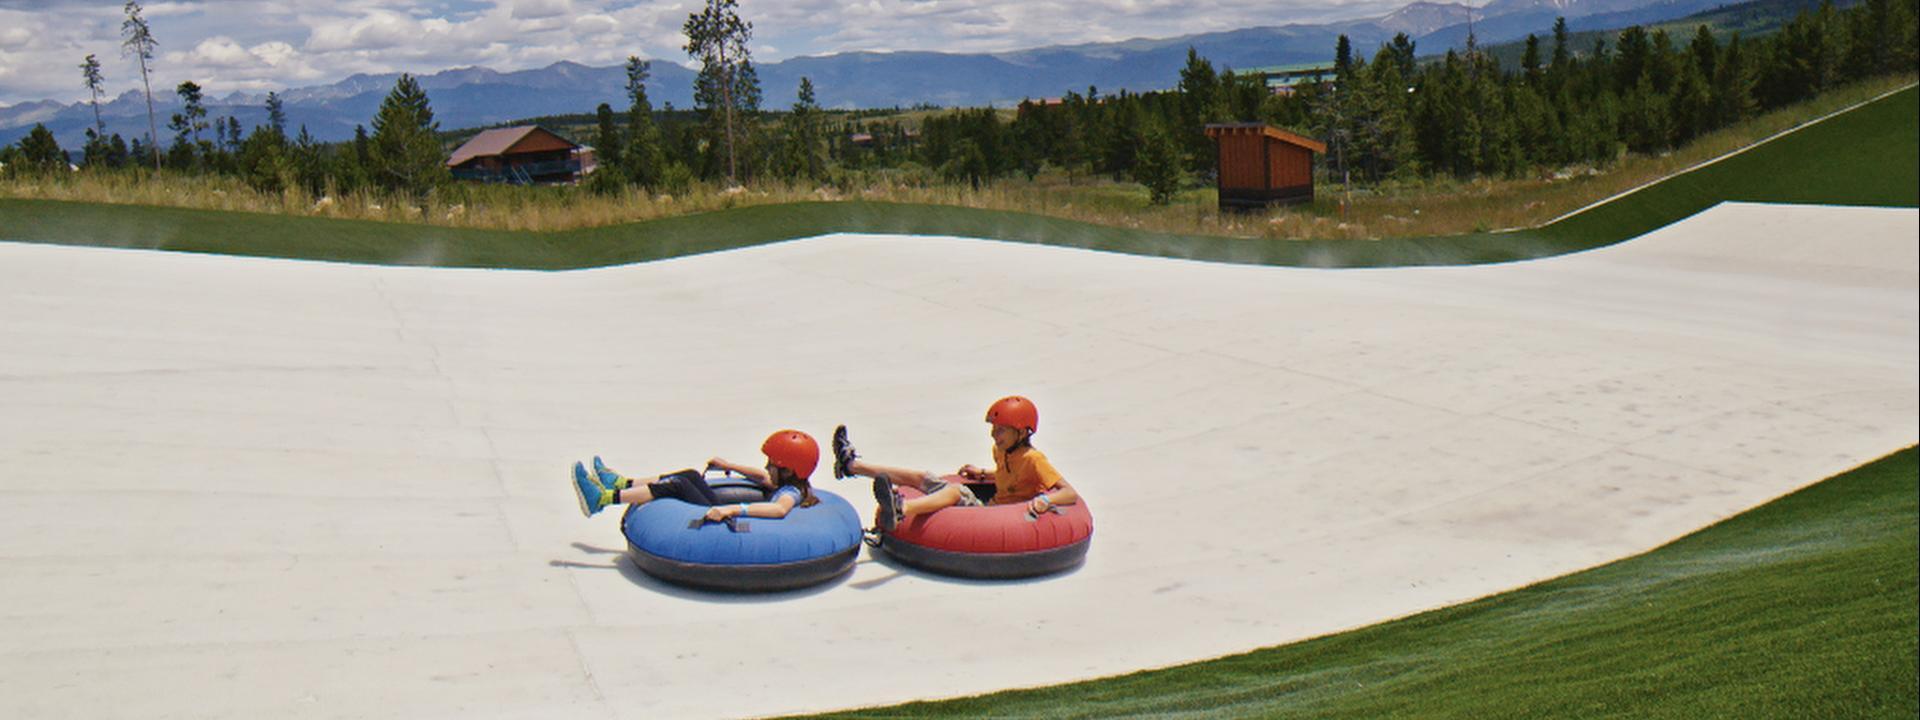 Summer Tubing at Snow Mountain Ranch-YMCA of Rockies